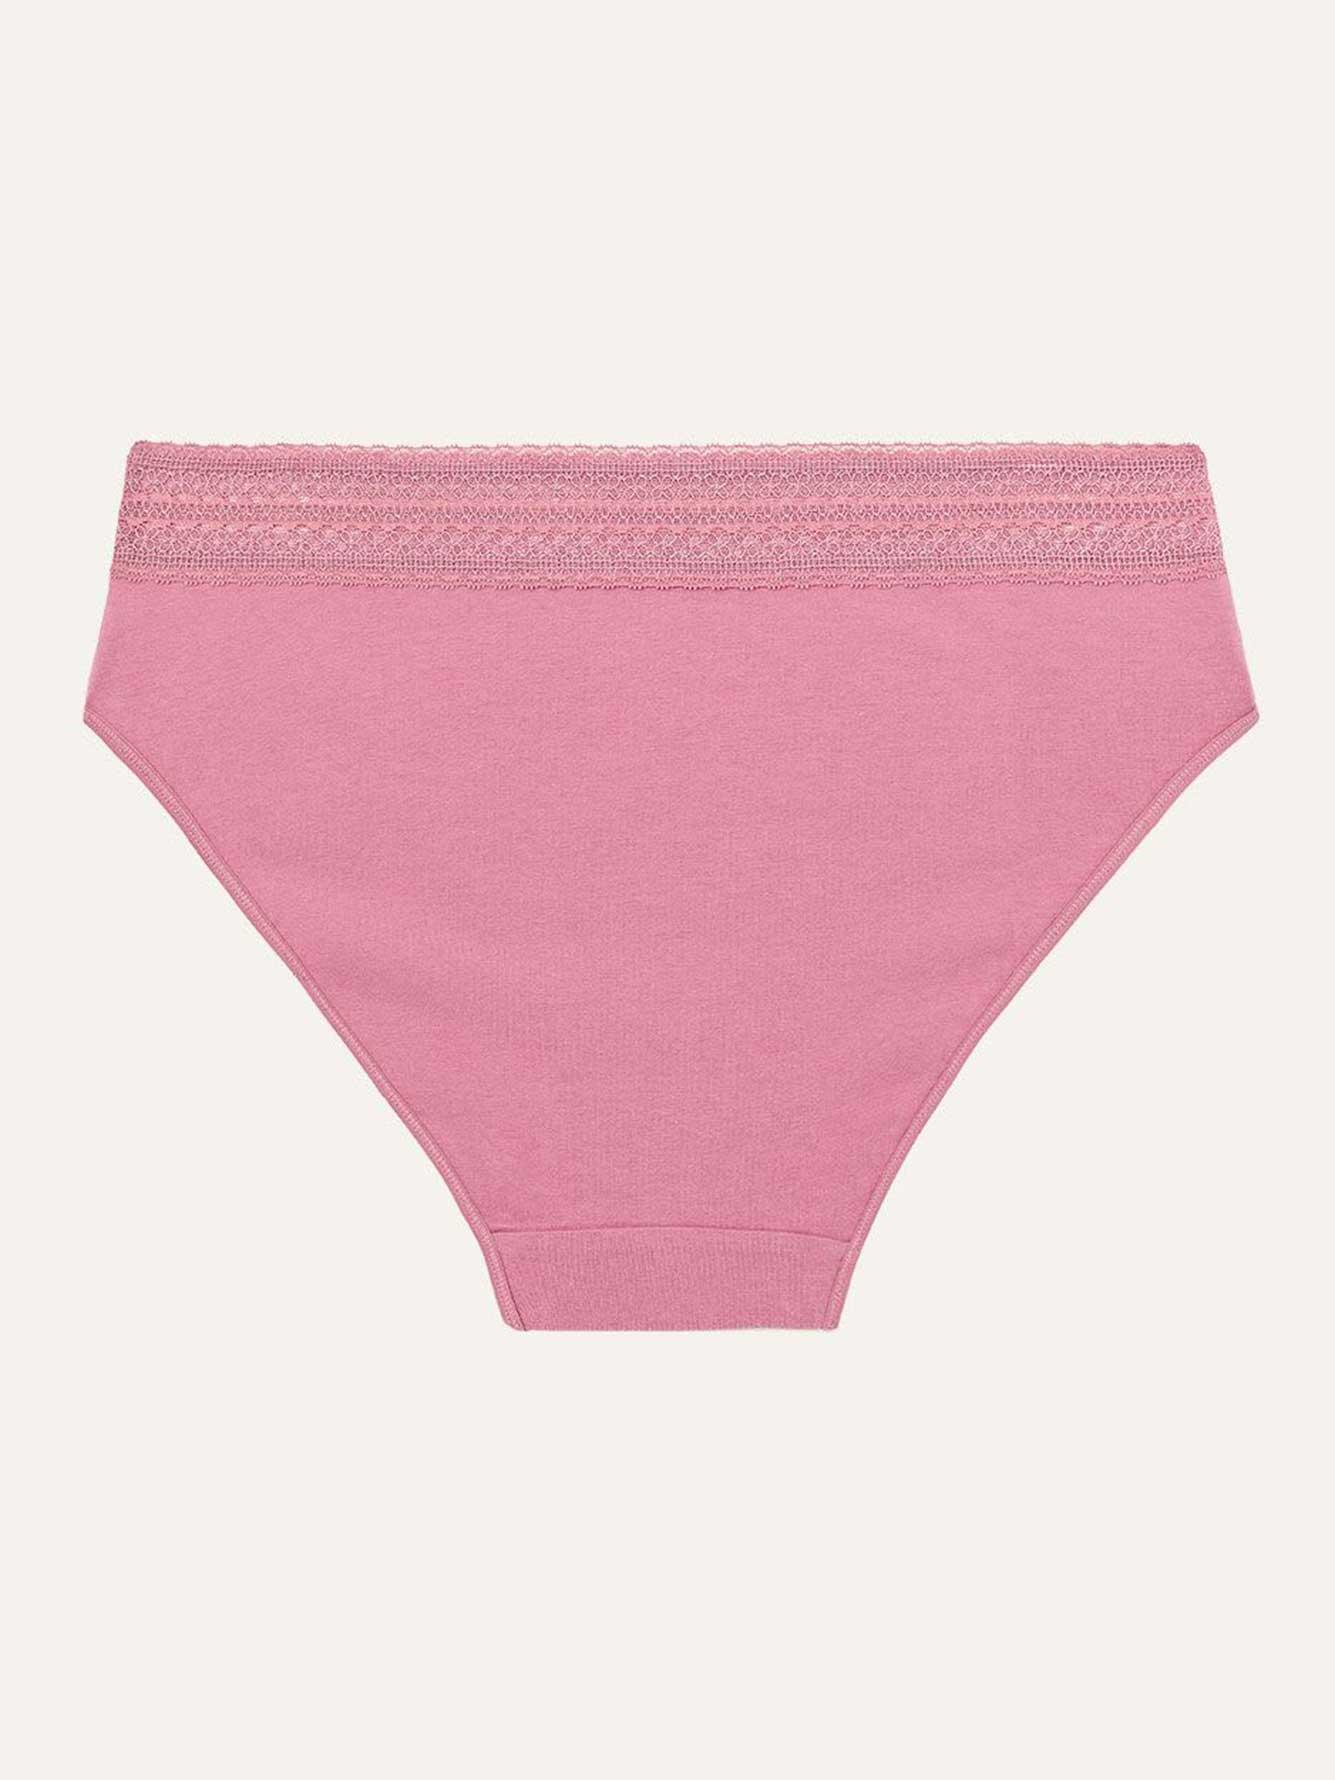 834f33c28 High Cut Cotton Panty with Lace - Déesse Collection